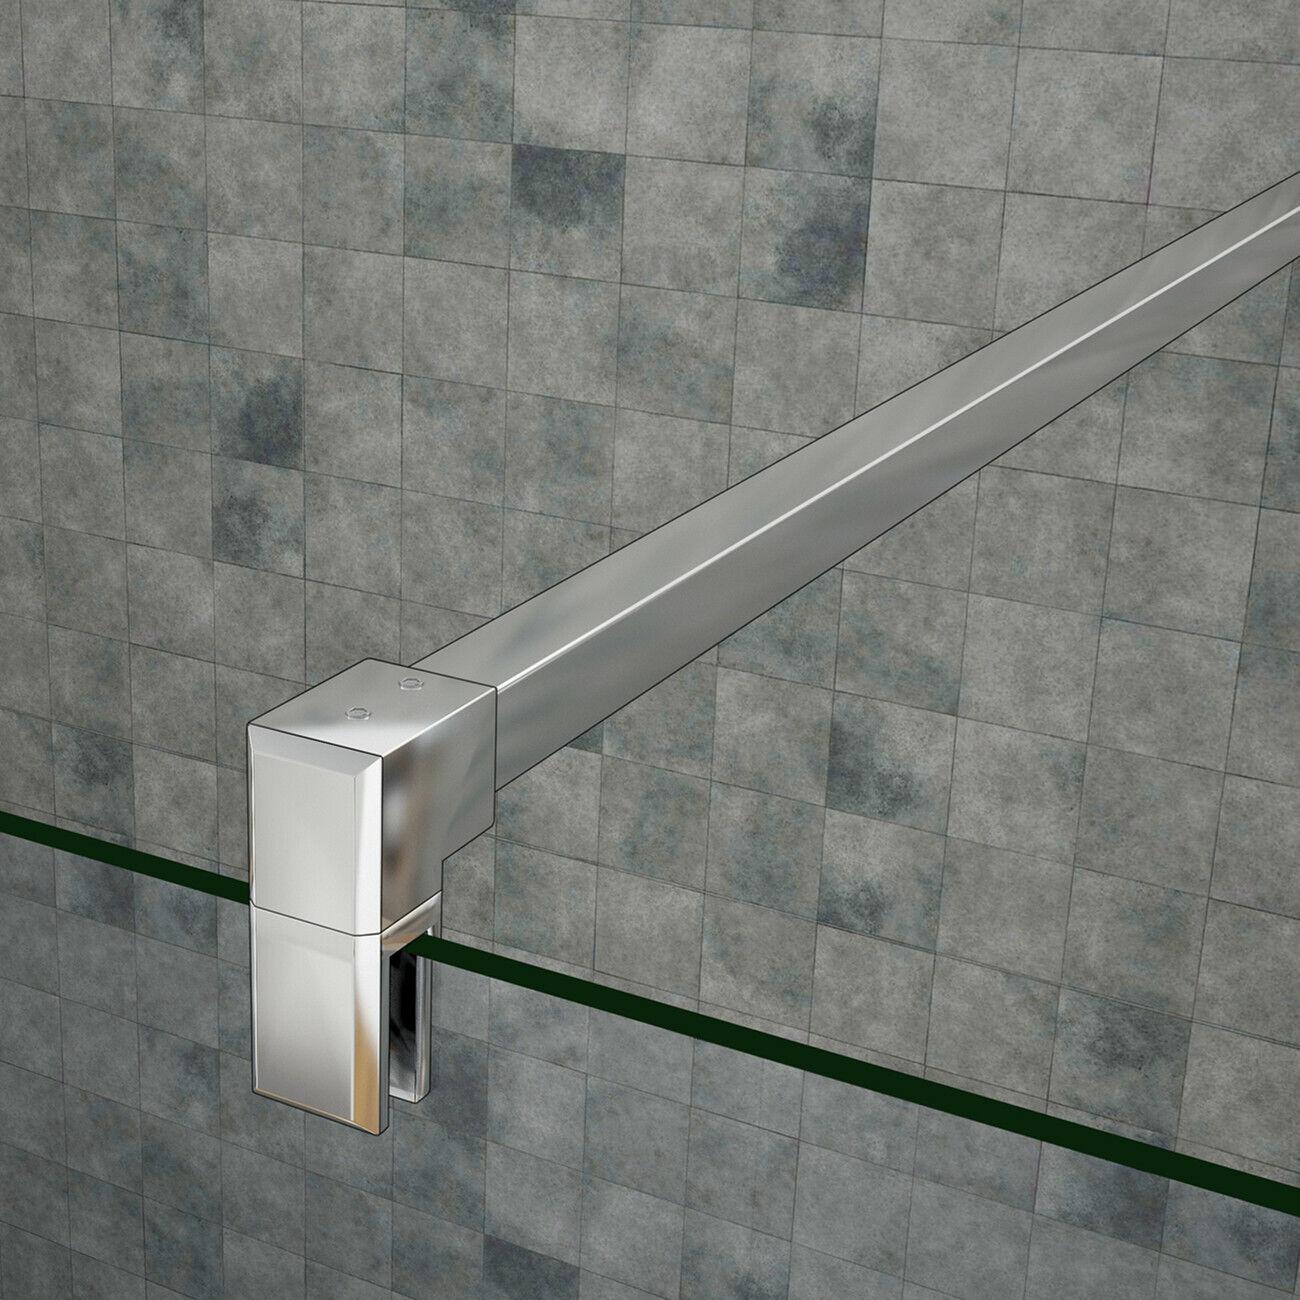 Faltbare+drehbar Walk NANO ESG-glas Duschtrennwand Duschabtrennung Bodengleich